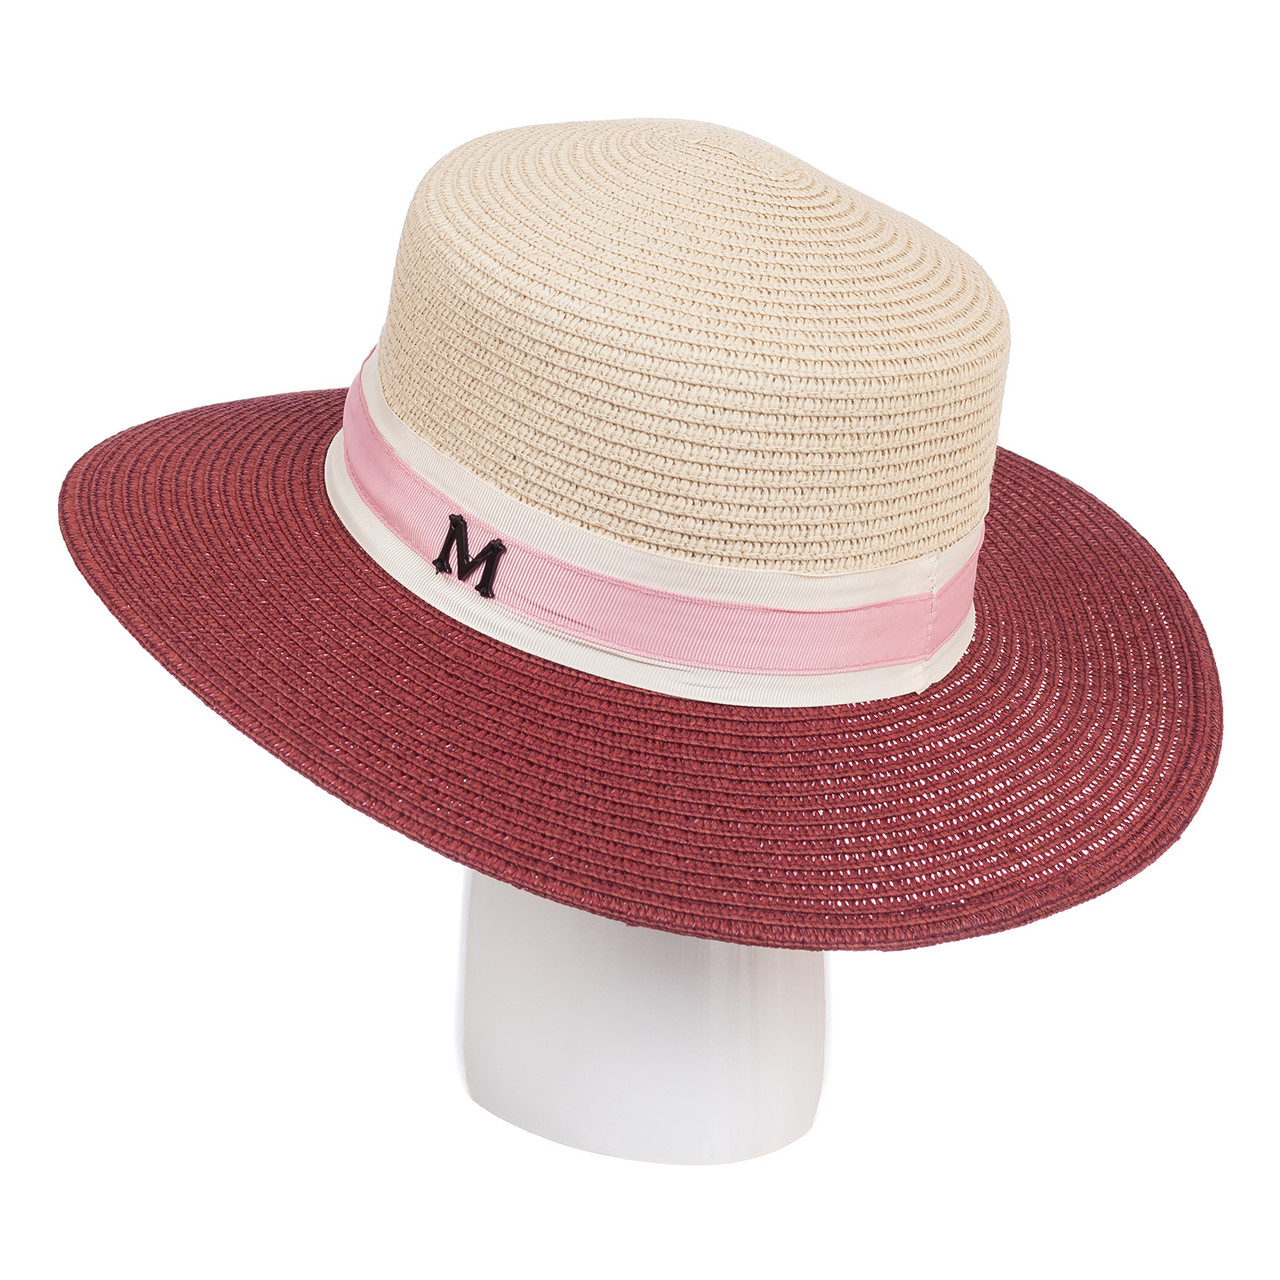 Шляпа бордо+св.бежевый  ( ШС-19-27 )